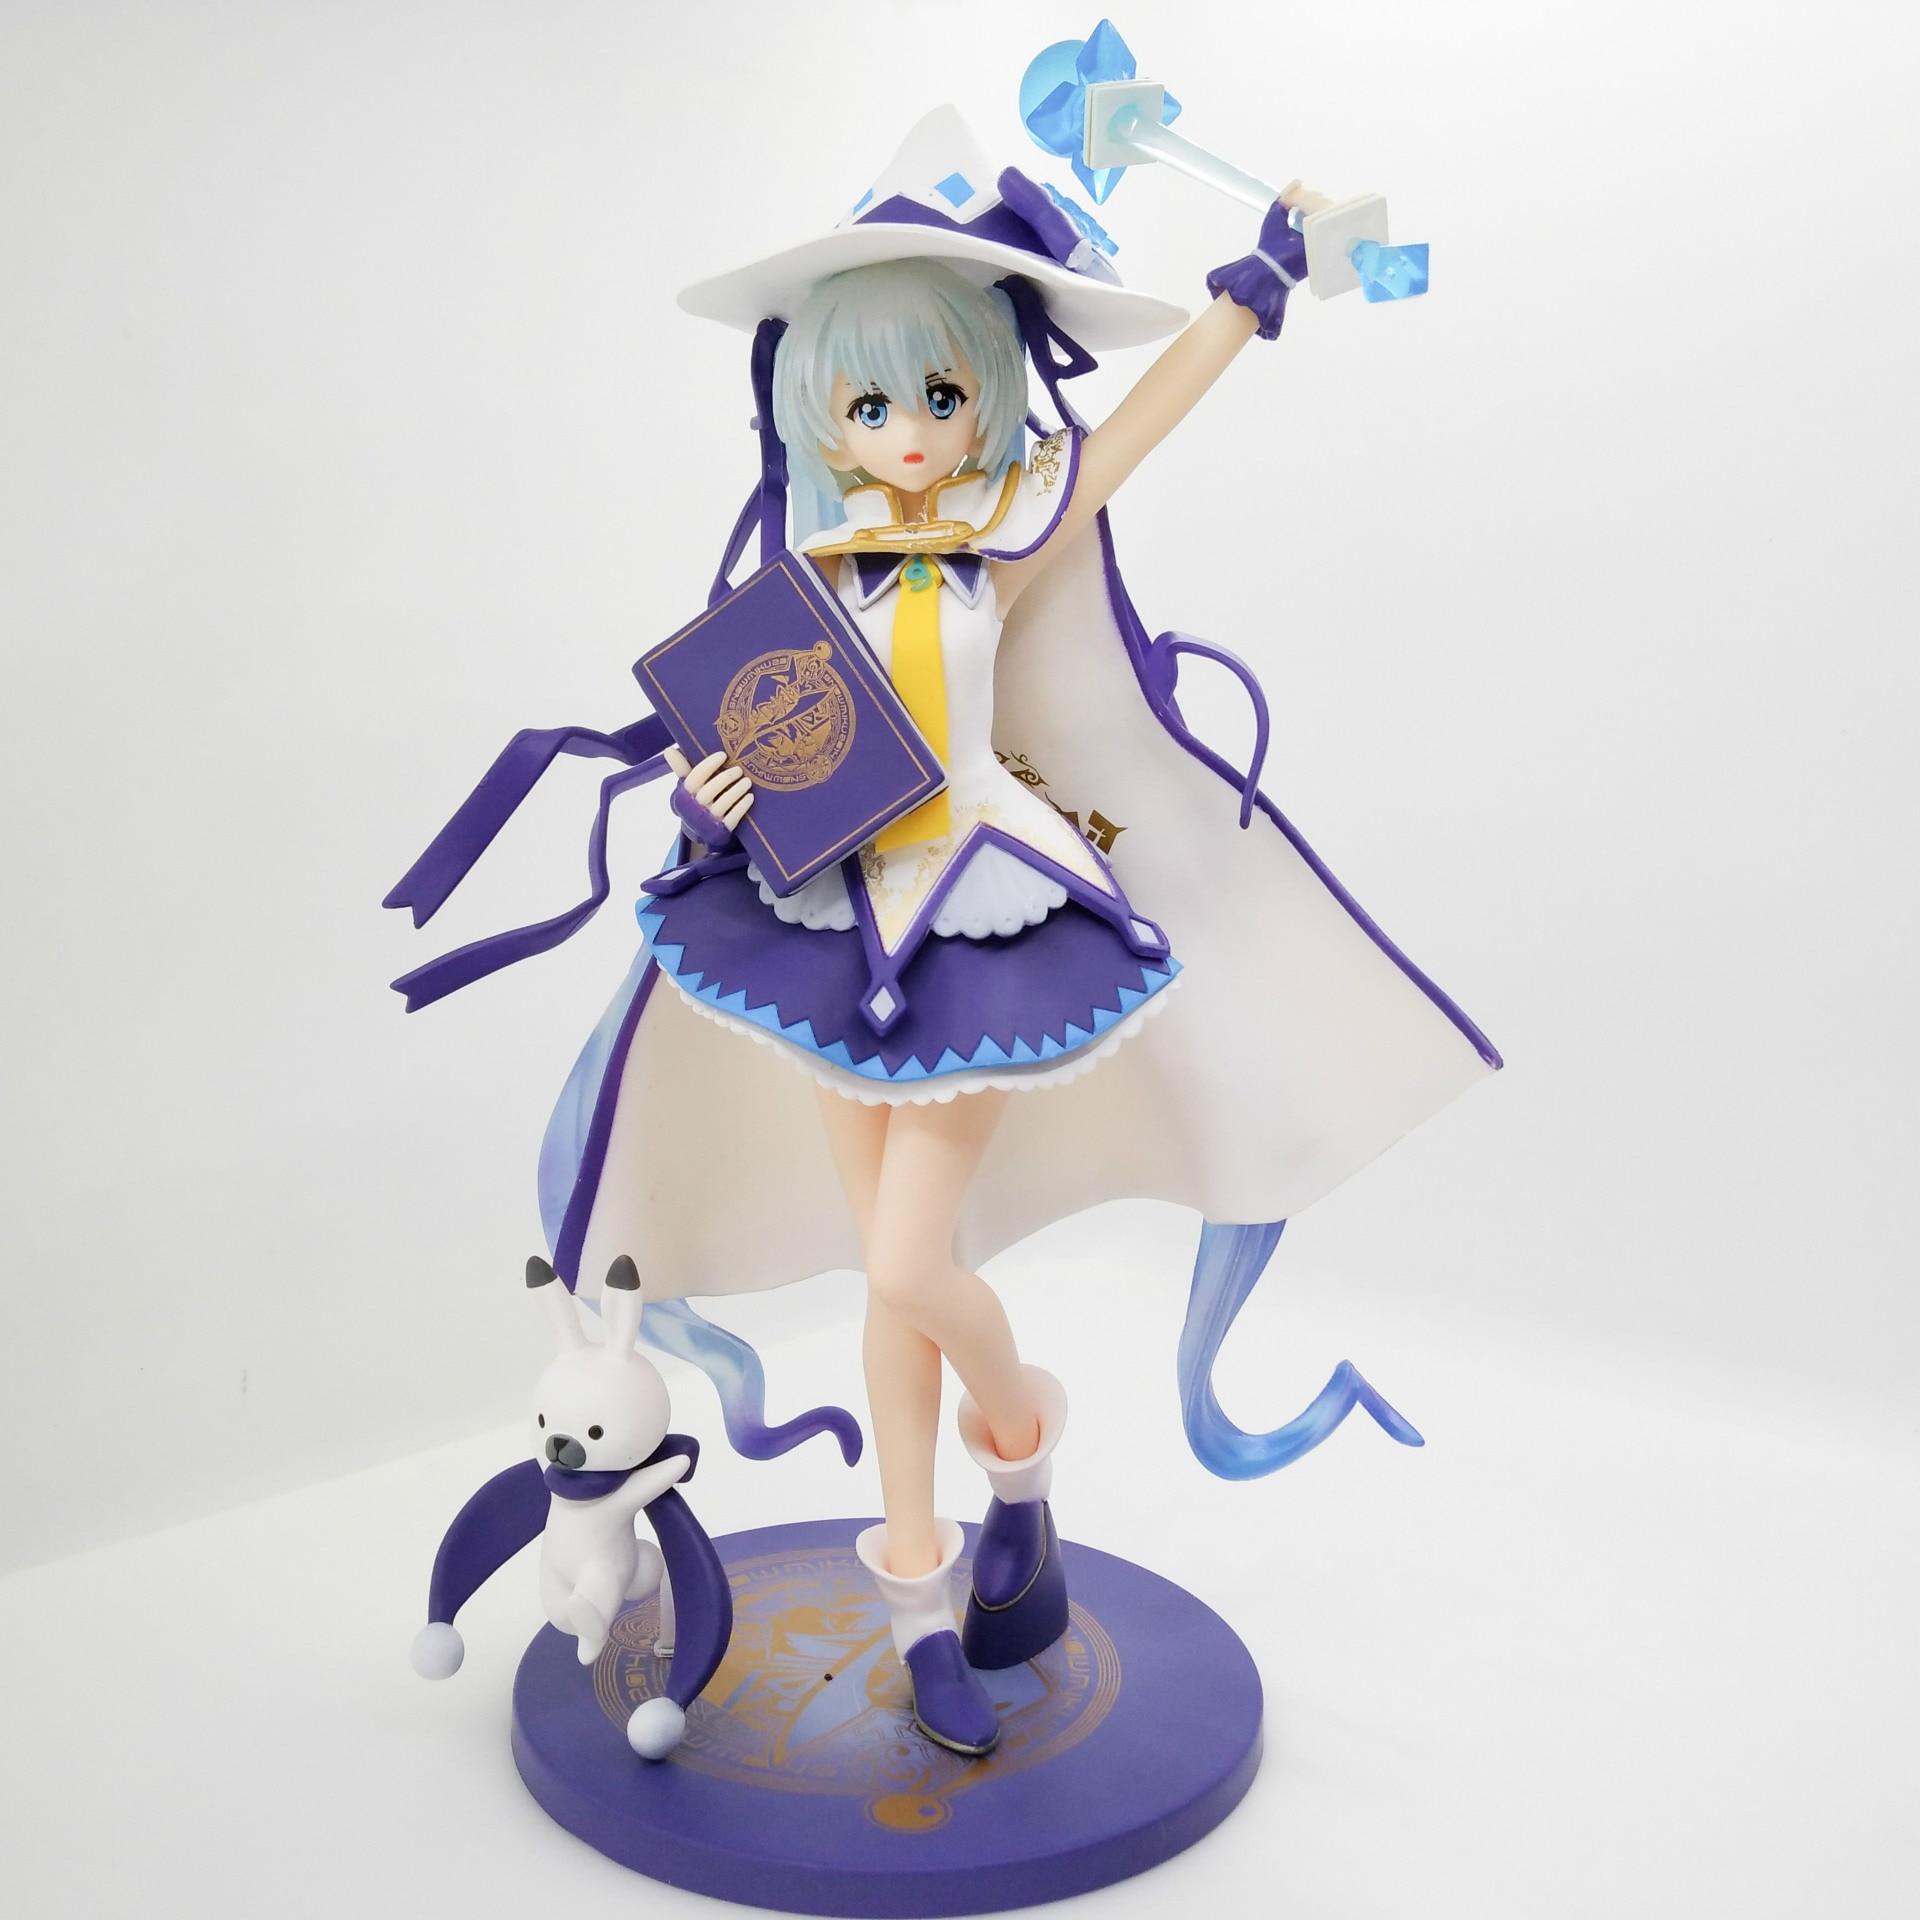 Hatsune Miku Vocaloid Arcade Future Tone Deep Sea Girl Plush Doll US SELLER